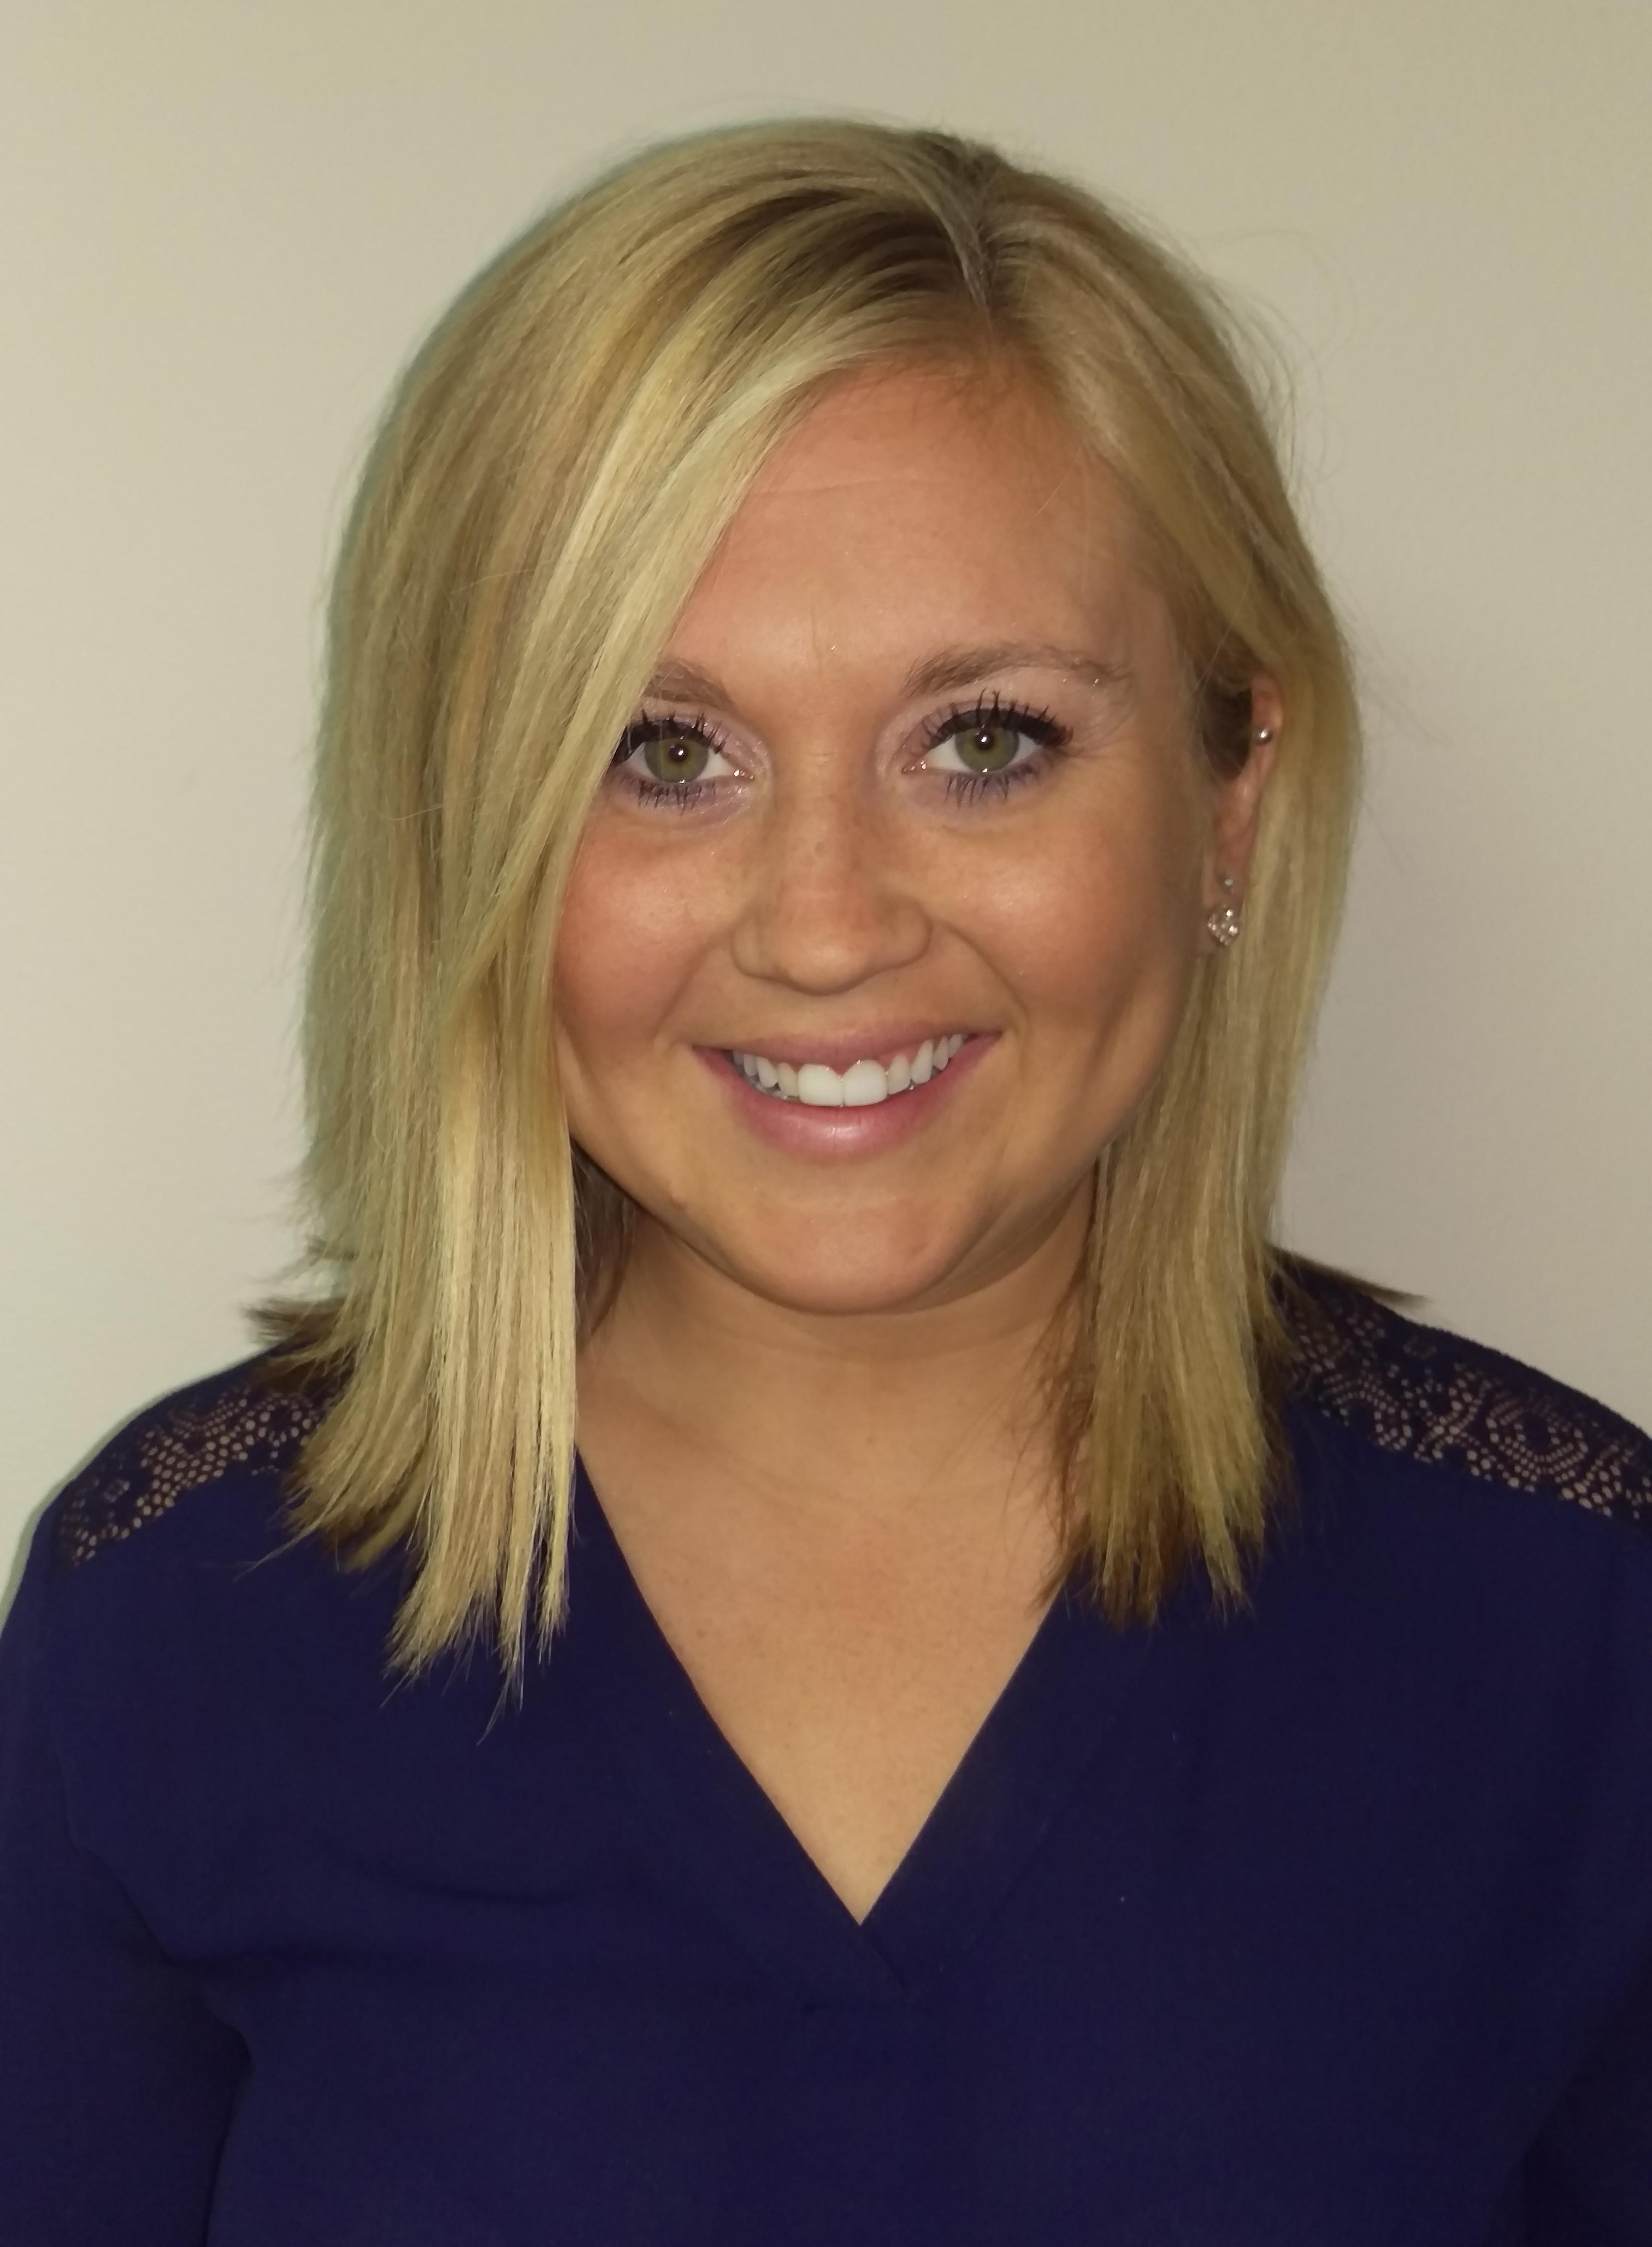 Kelly Lybrook, LIZard Apparel & Promotions